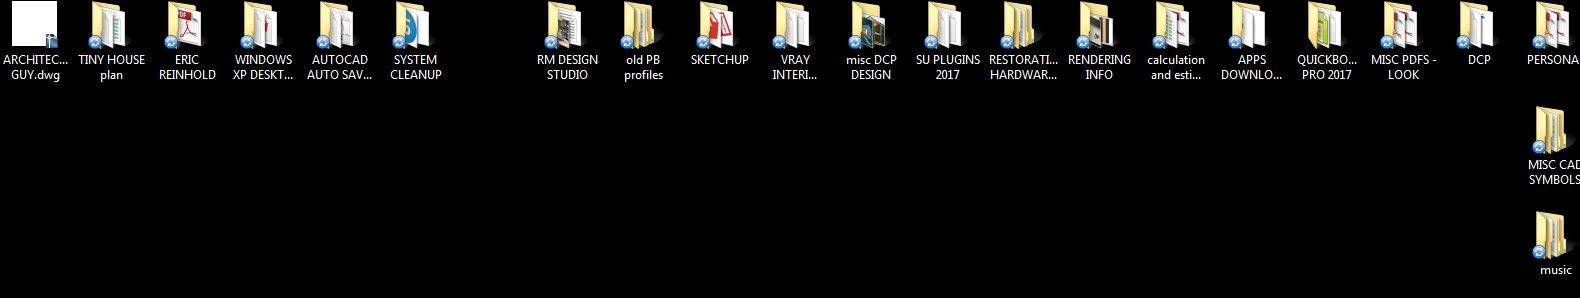 how to put dropbox on desktop